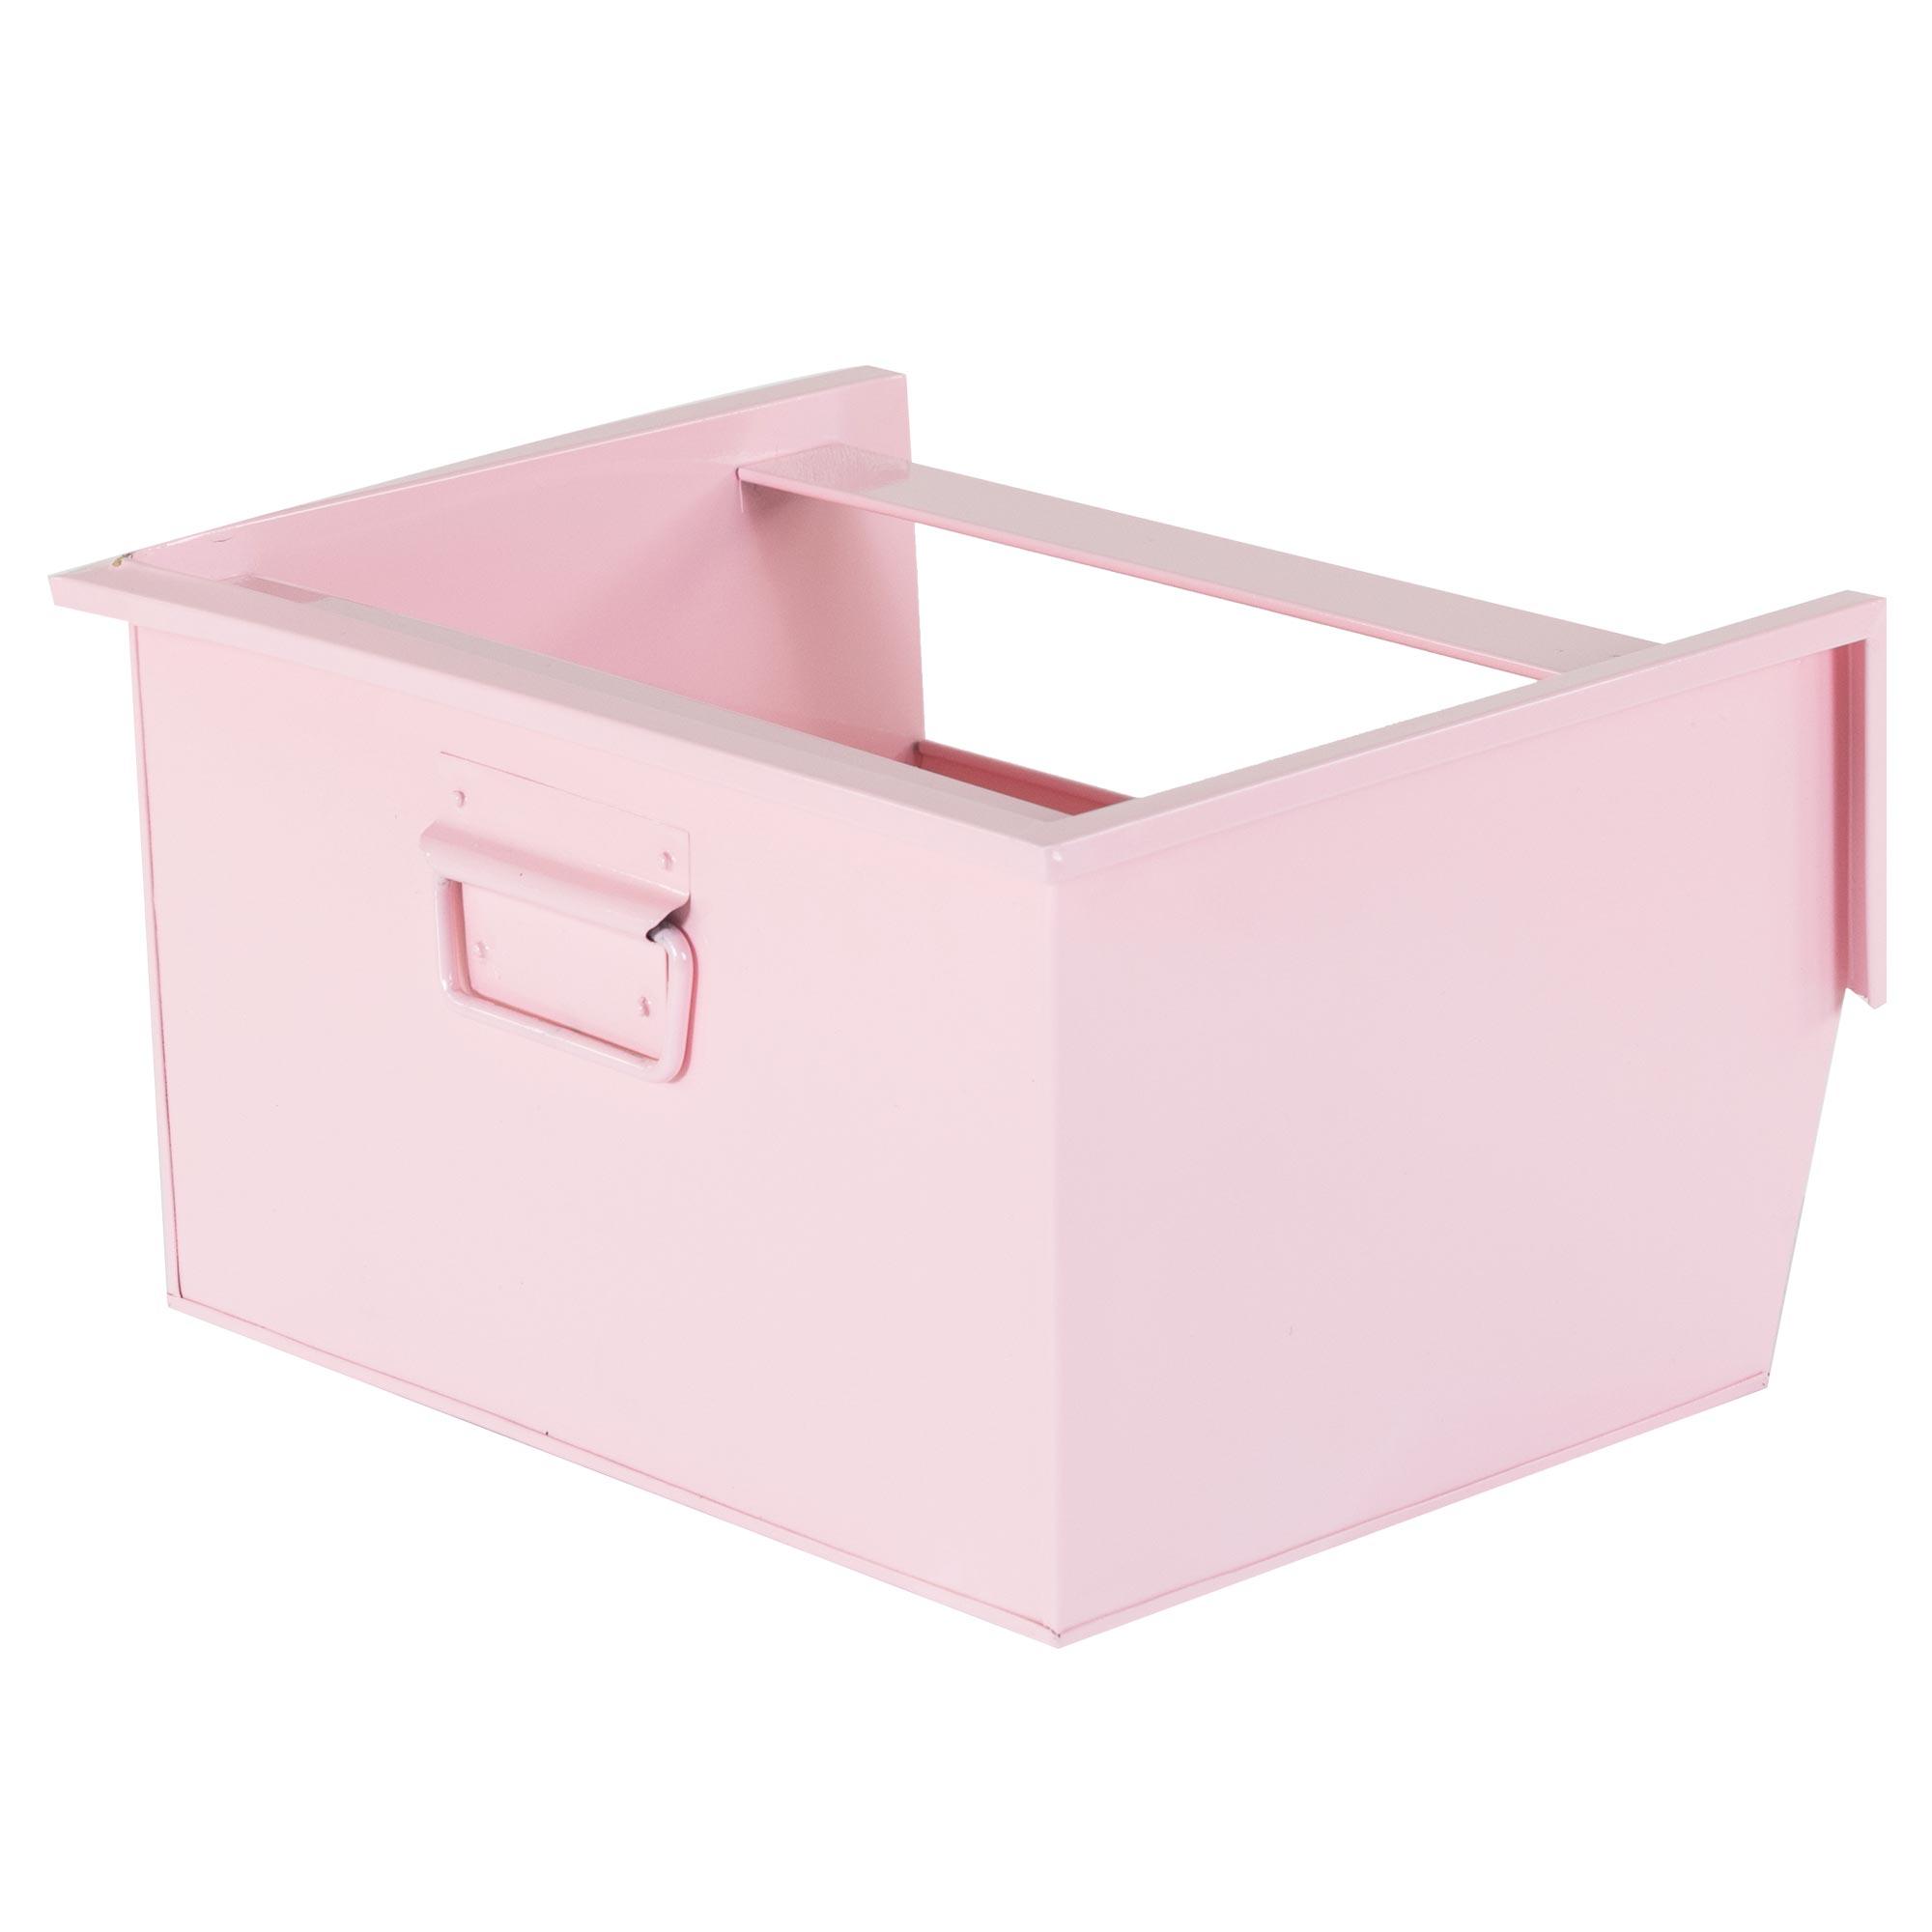 box de rangement an acier viny lot de 3 rose. Black Bedroom Furniture Sets. Home Design Ideas